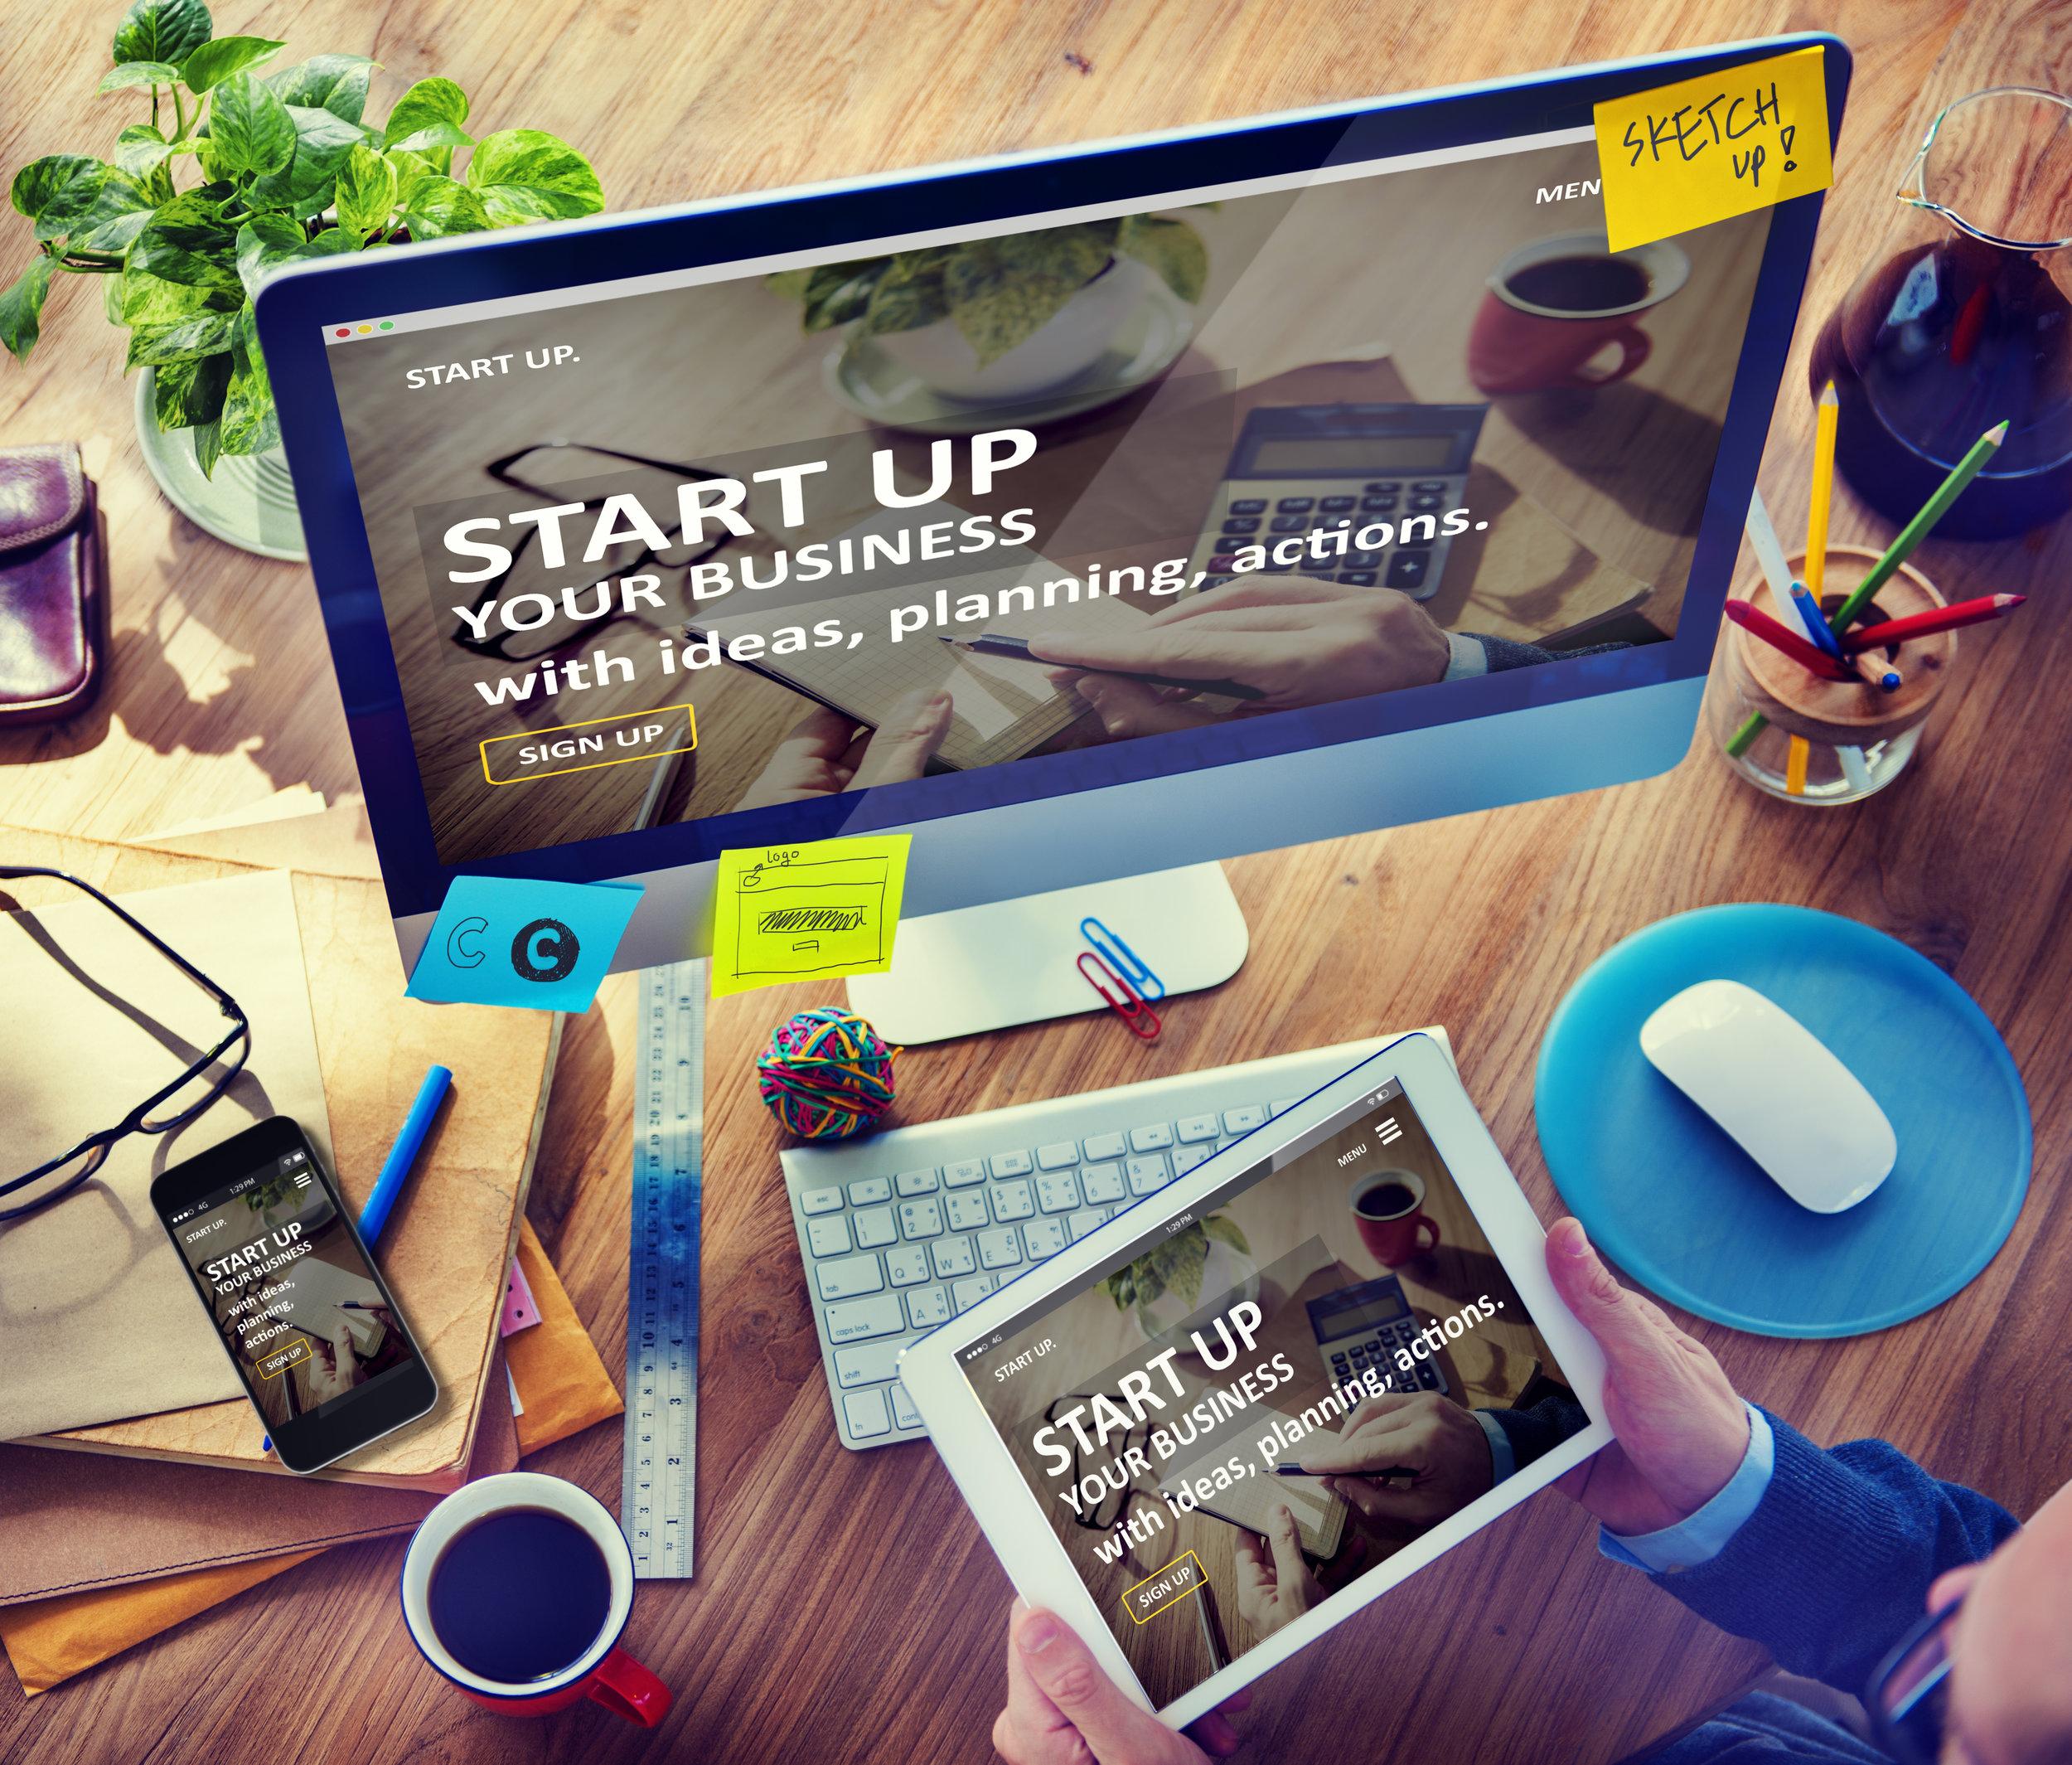 glassboro business start-up